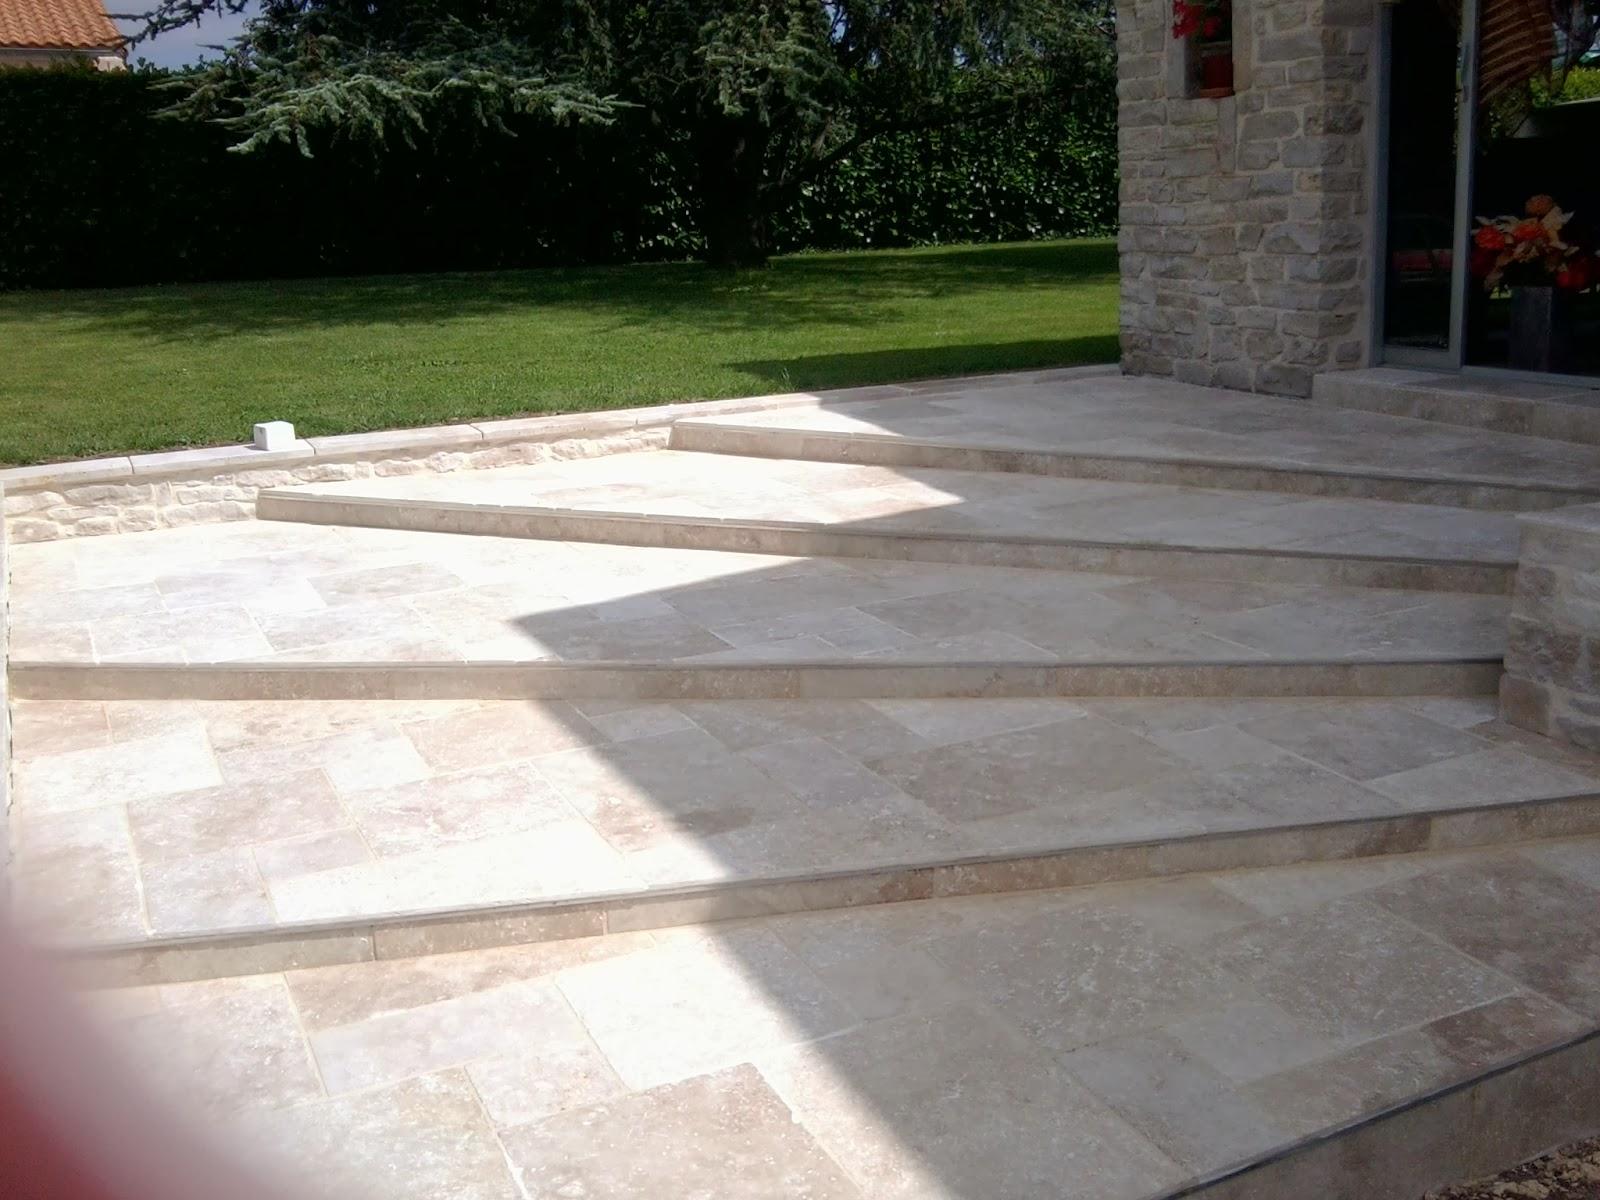 escalier en travertin casa tijeral en san isidro lima escalier travertin escalier en pierre. Black Bedroom Furniture Sets. Home Design Ideas